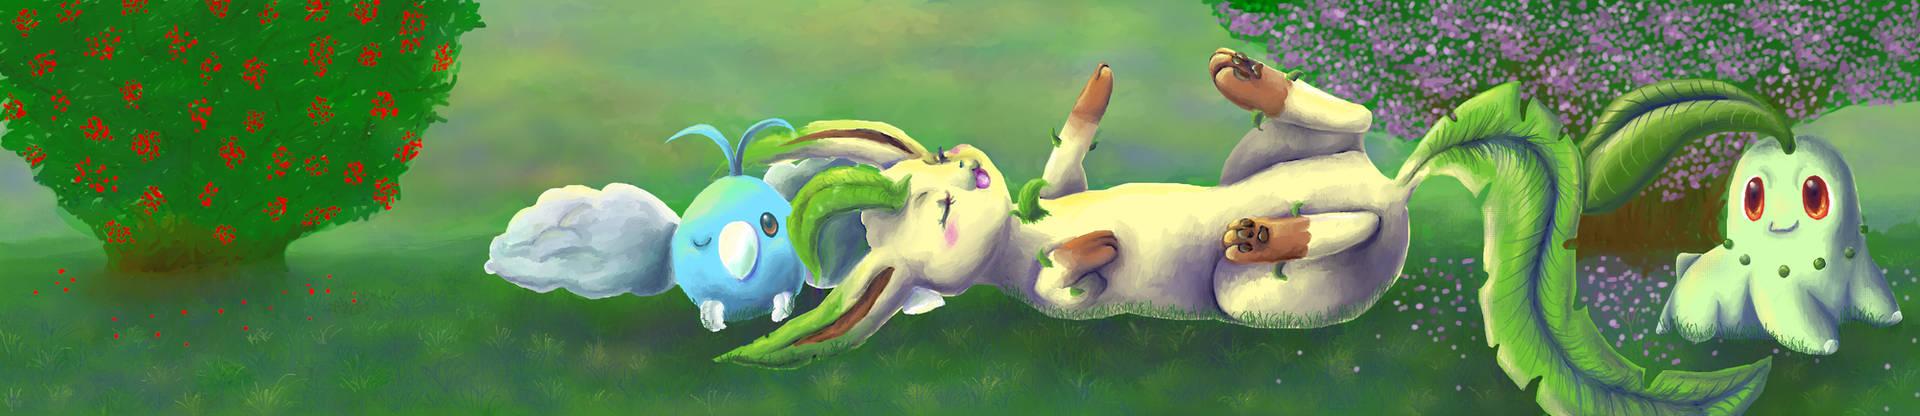 Sunbathing in the Grass